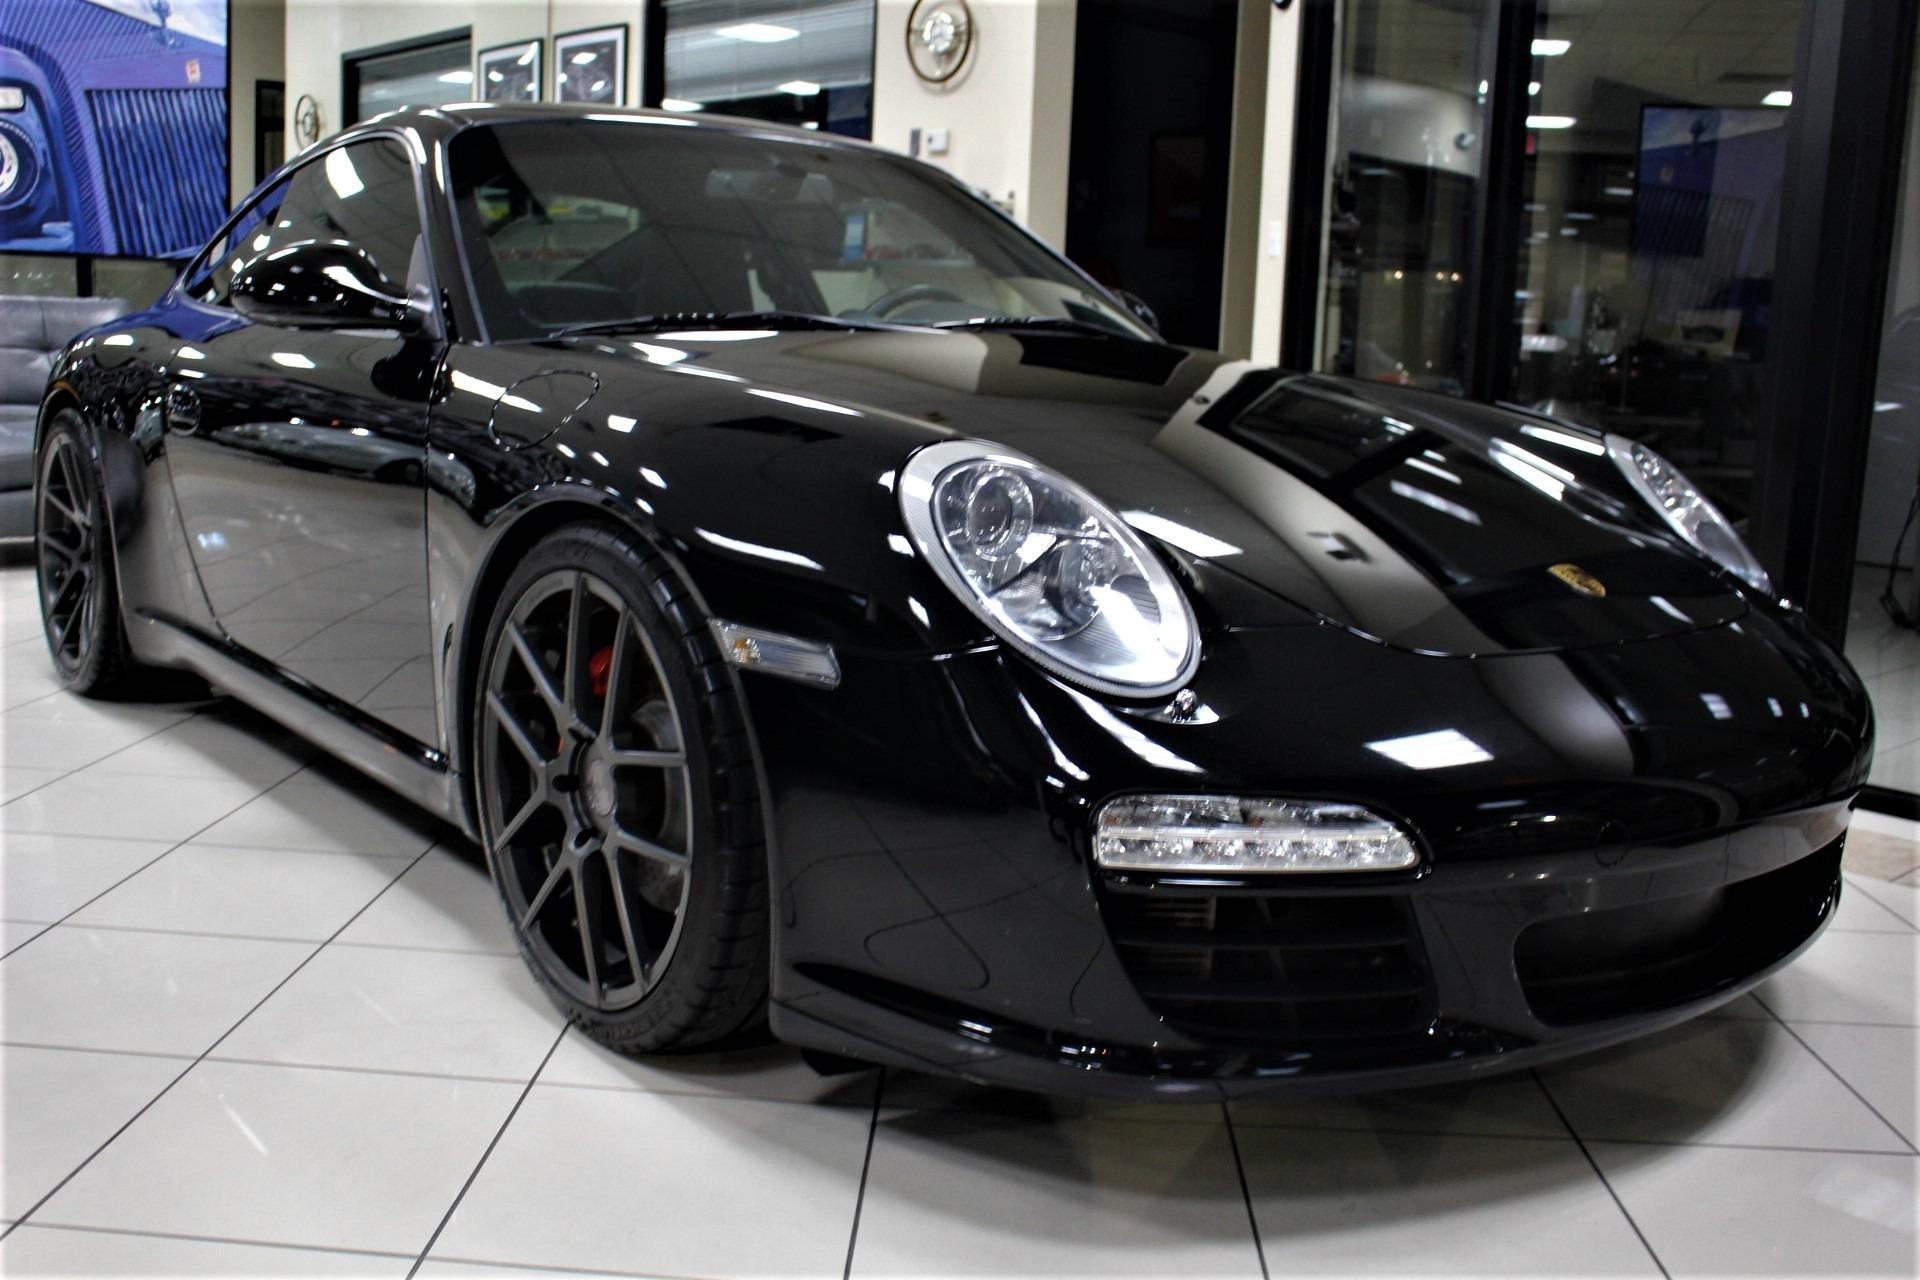 Used 2009 Porsche 911 Carrera S for sale $62,850 at The Gables Sports Cars in Miami FL 33146 2